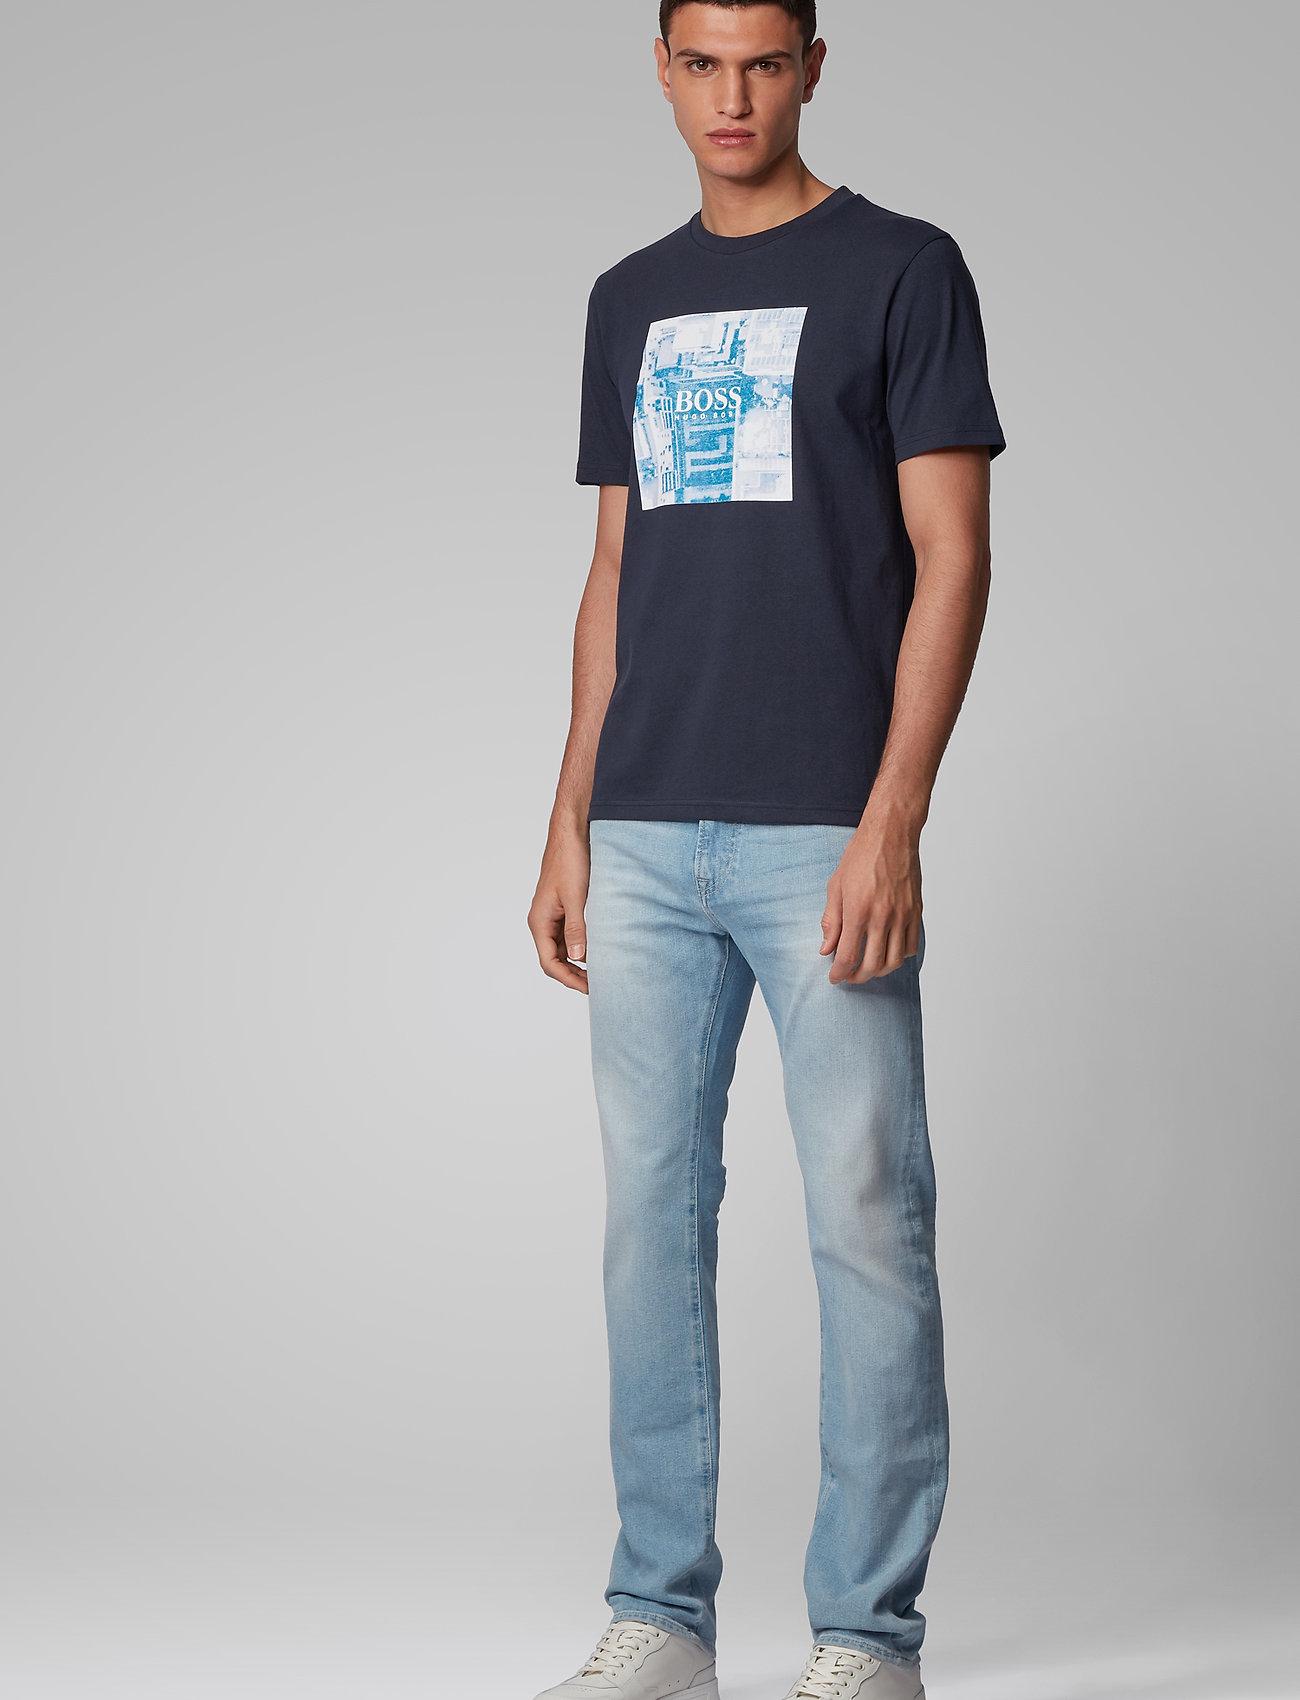 BOSS - Troaar 5 - kortærmede t-shirts - dark blue - 0